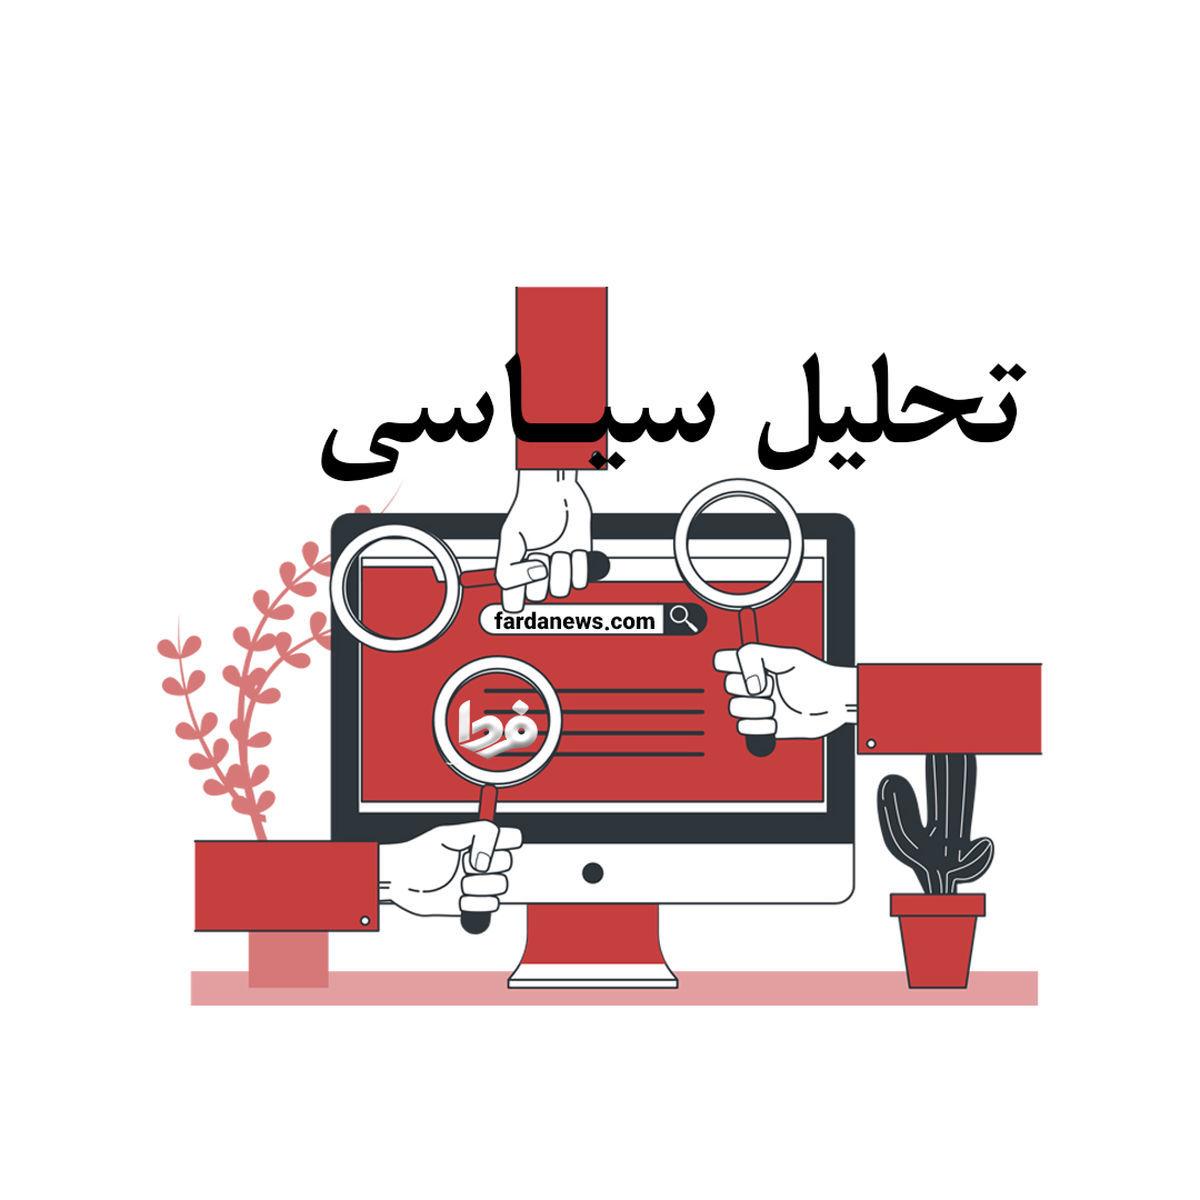 برجام، دولت، قدرت و طالبان